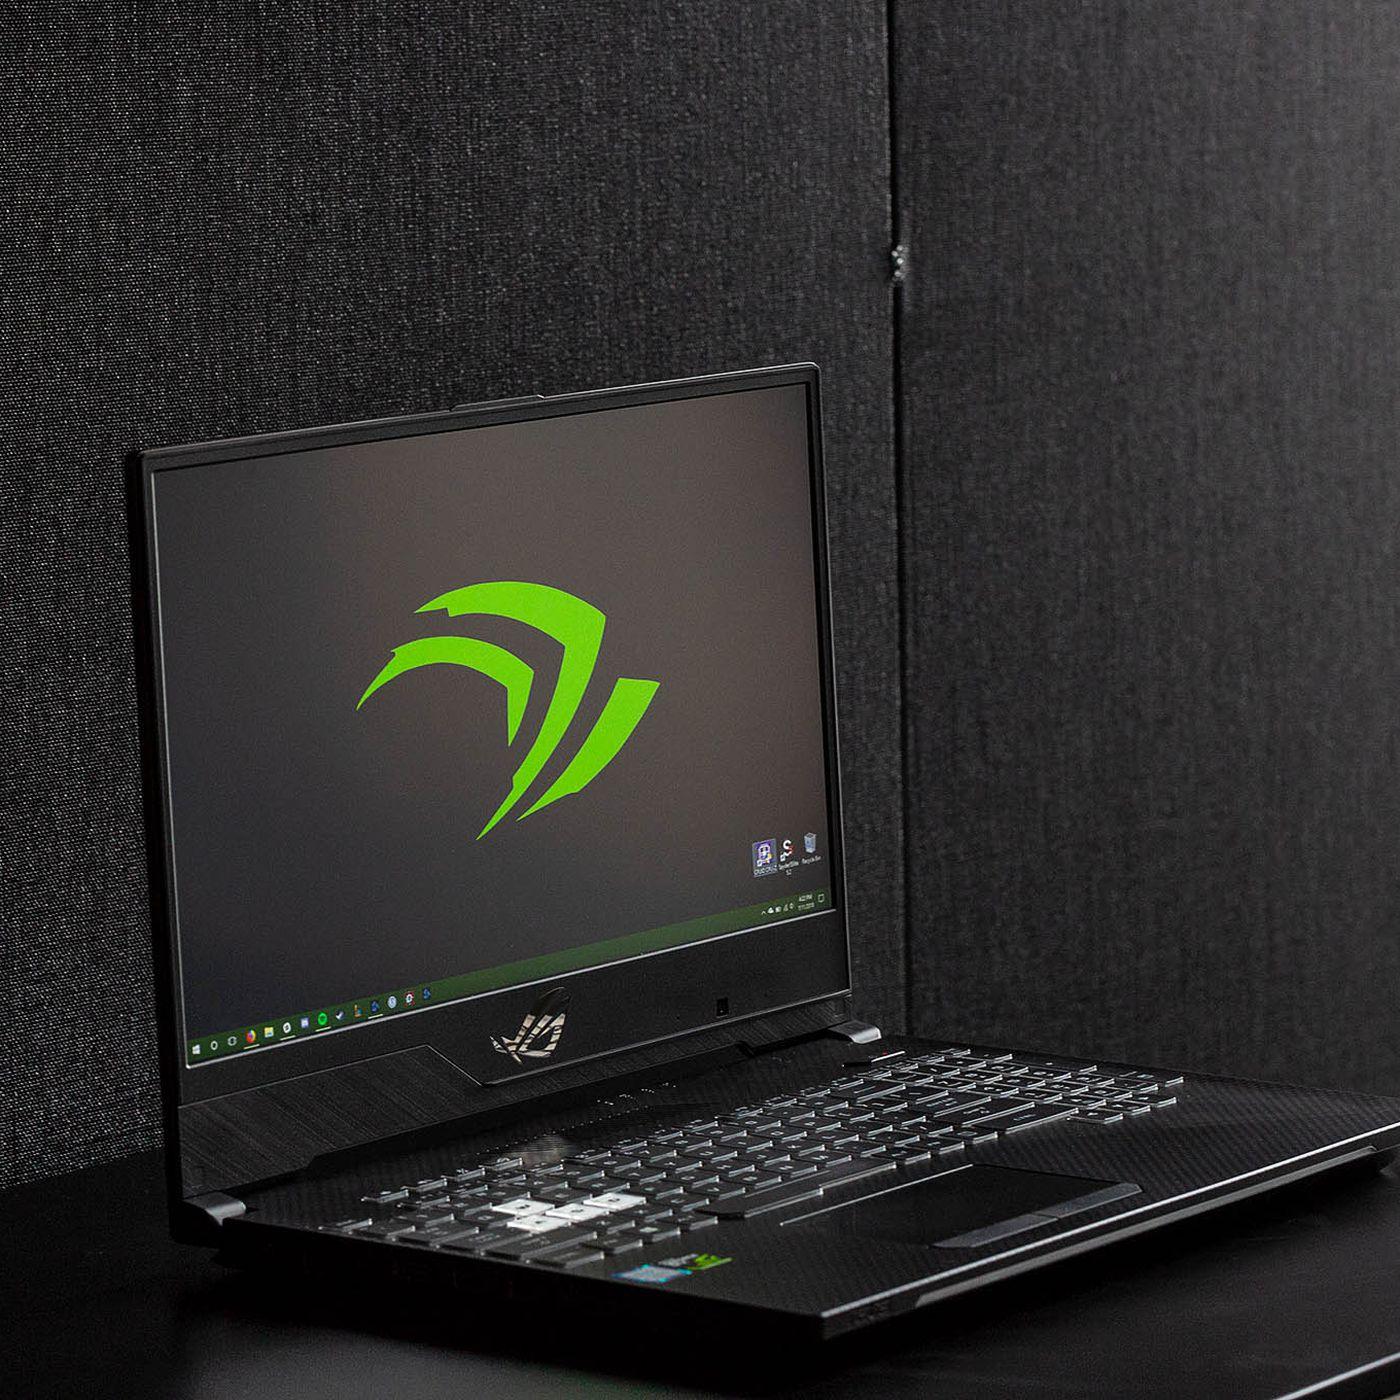 Asus Strix Scar II laptop review: lights, camo, action - The